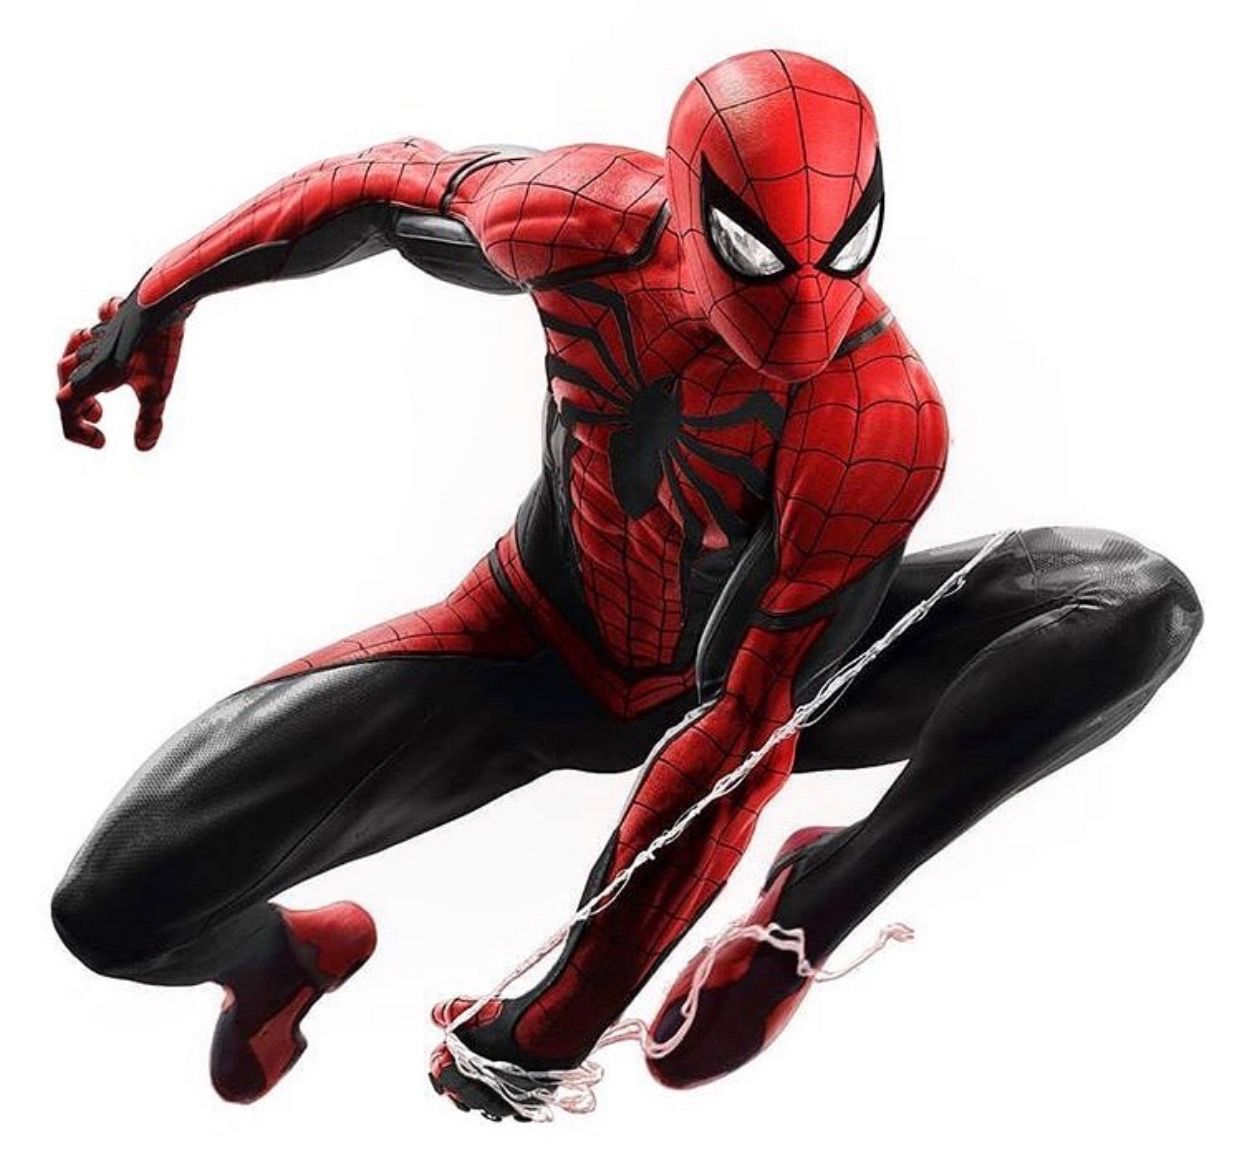 Superior Spider Man Spiderman Comic Marvel Comics Superheroes Spiderman